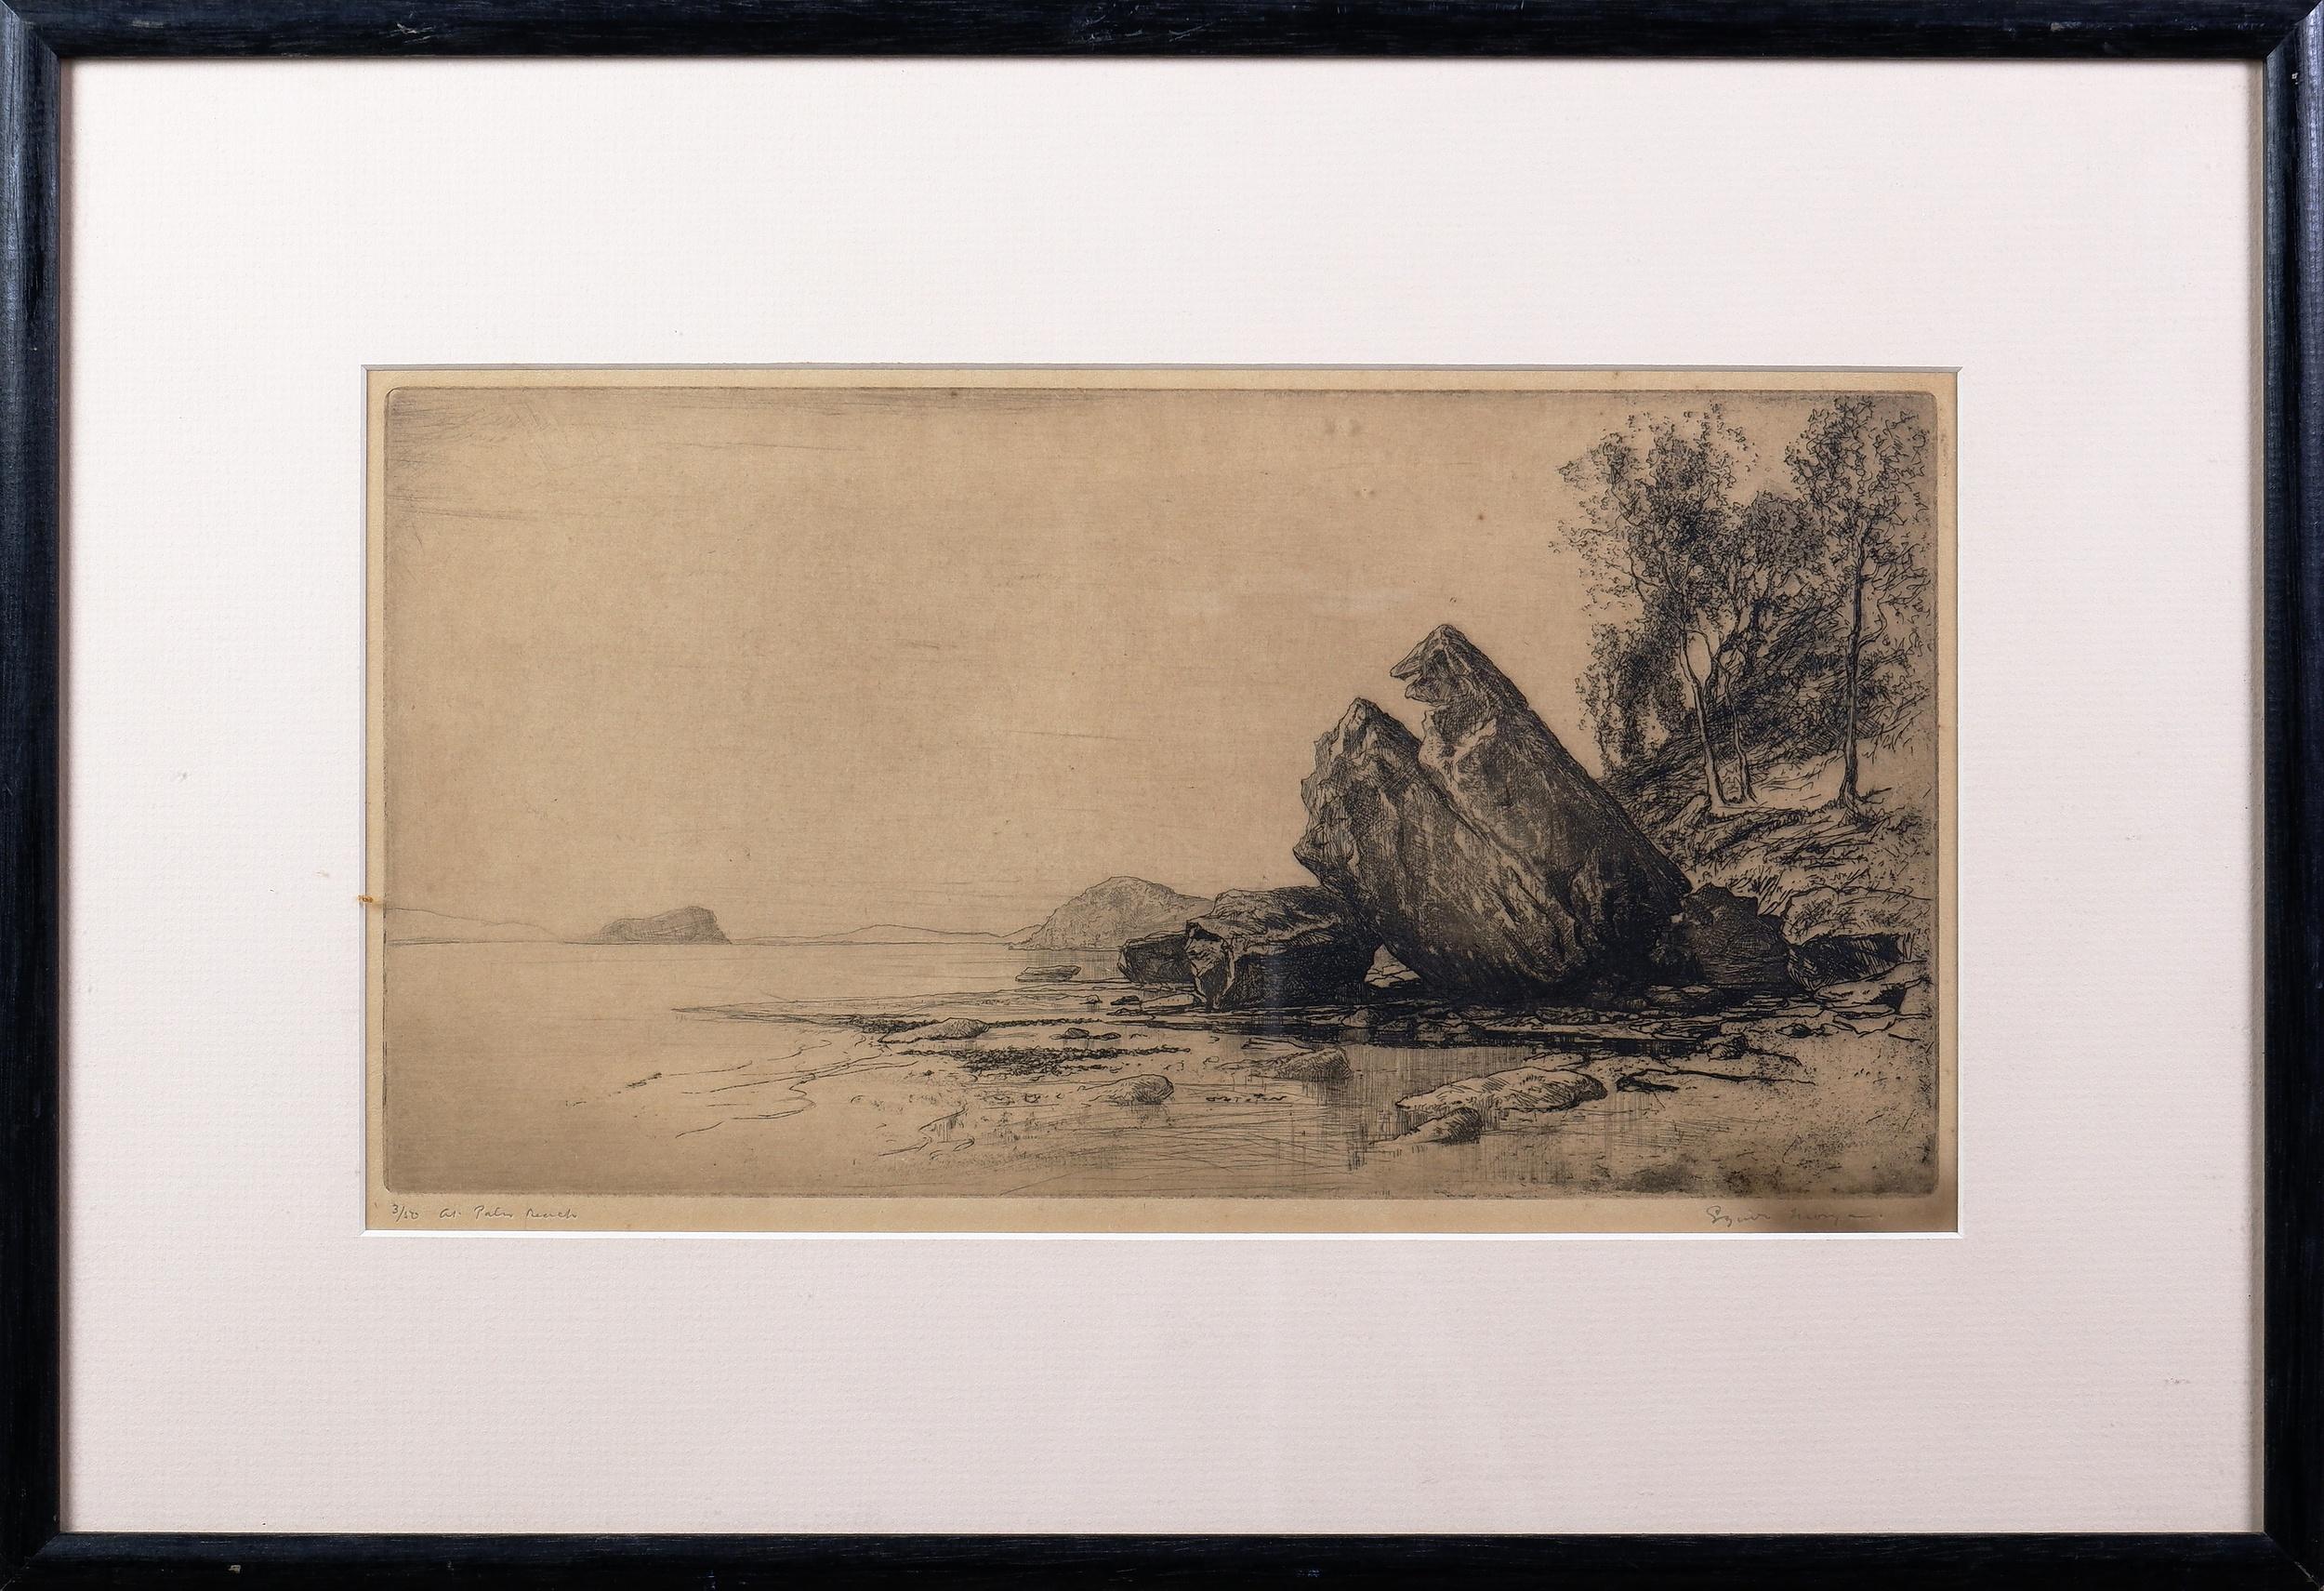 'Sydney Long (1871-1955), At Palm Beach, Etching'